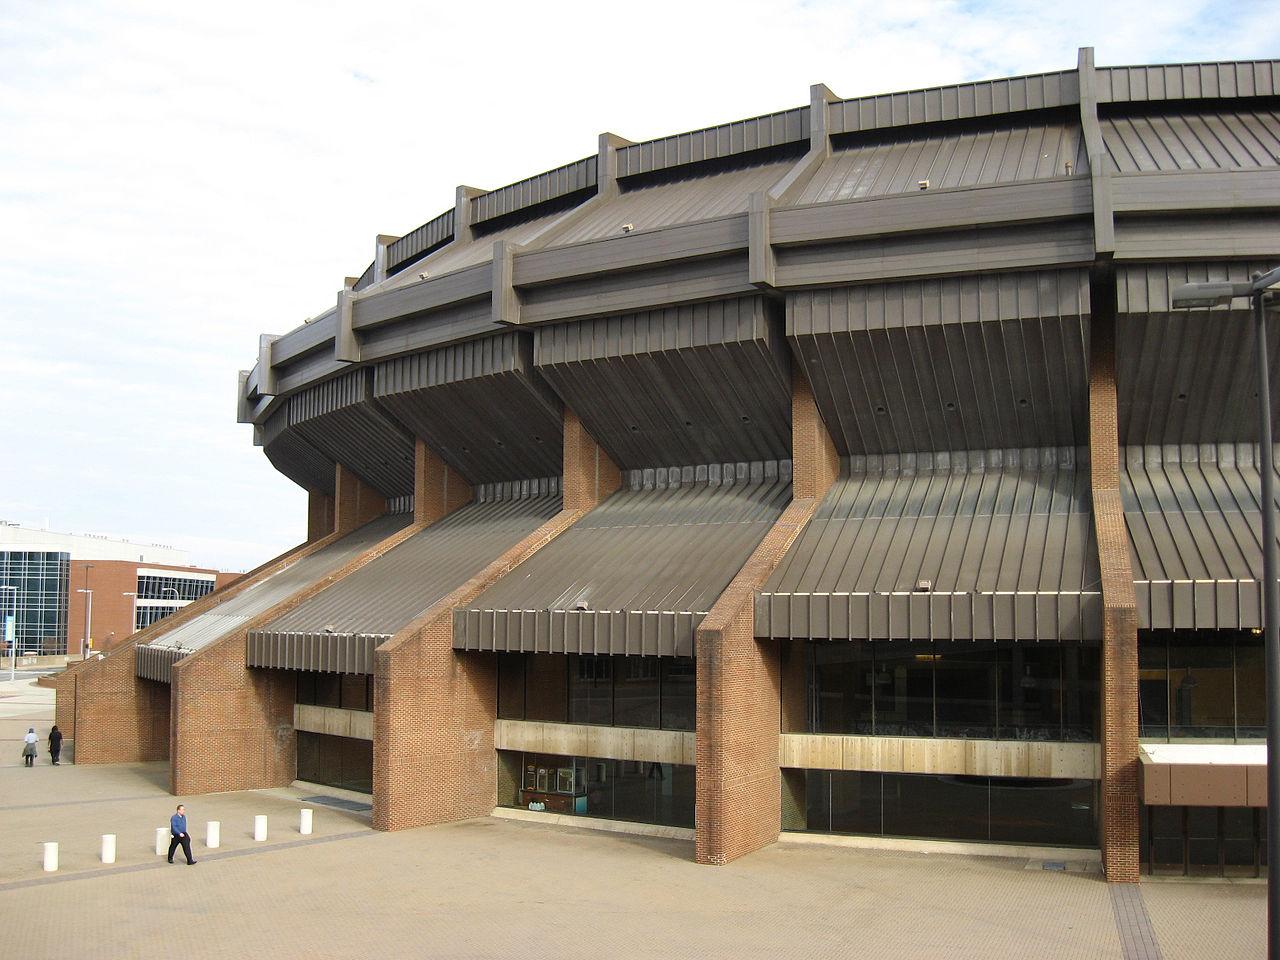 1280px-Richmond_Coliseum.jpg